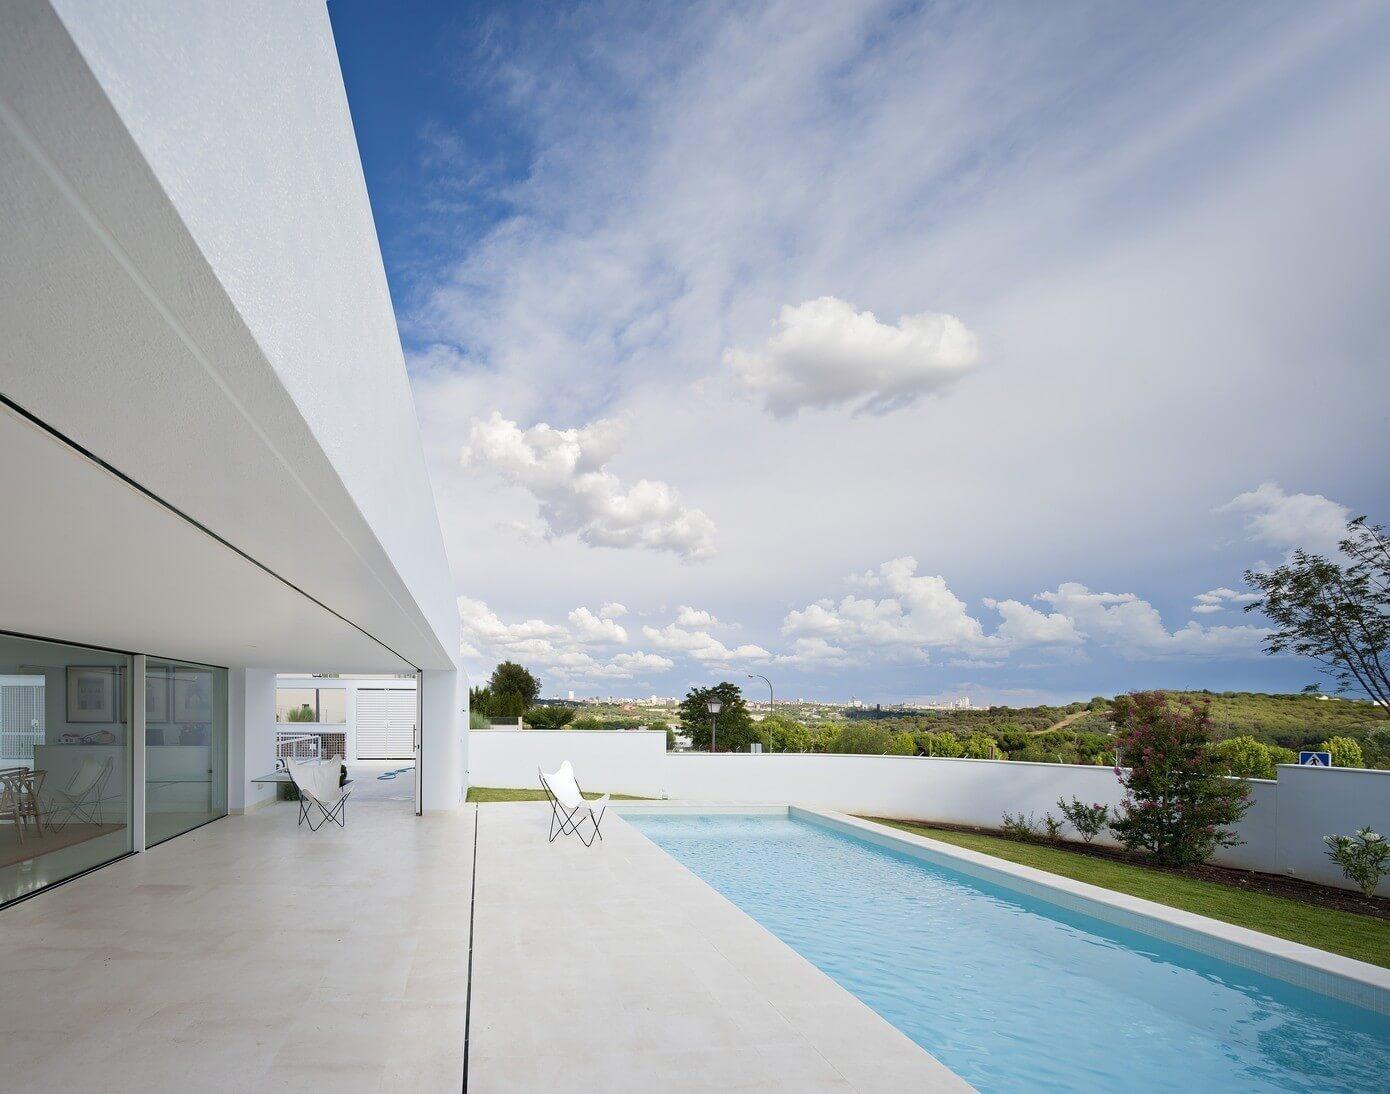 cala house by alberto campo baeza homeadore. Black Bedroom Furniture Sets. Home Design Ideas